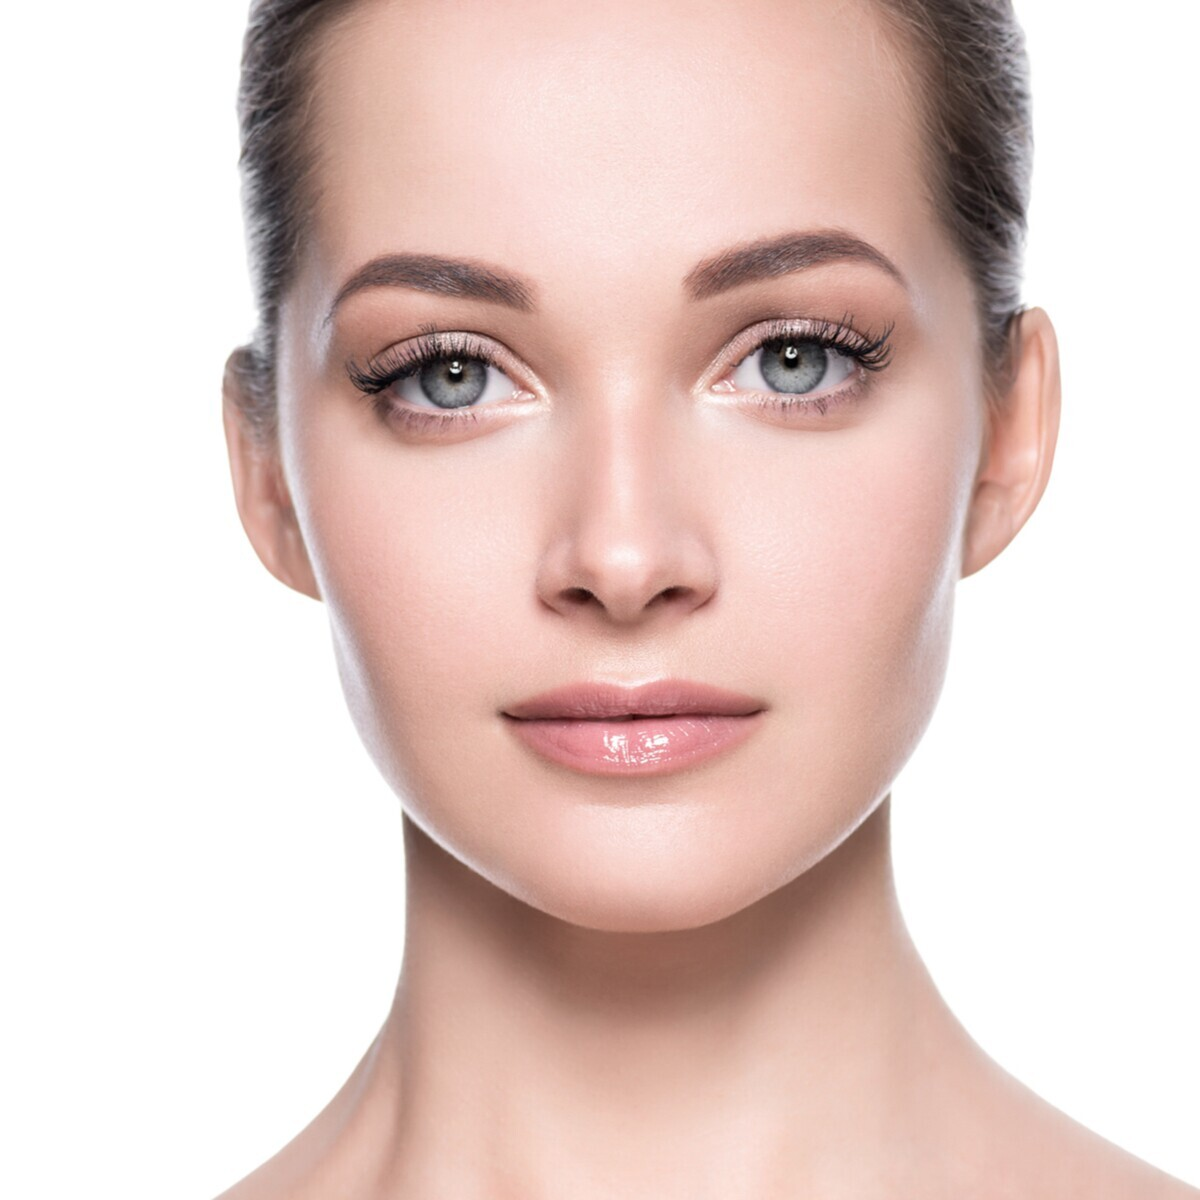 Seda Altuntaş Beauty Acarkent'te Hifu 6D Tek Seansta Cilt Gençleştirme